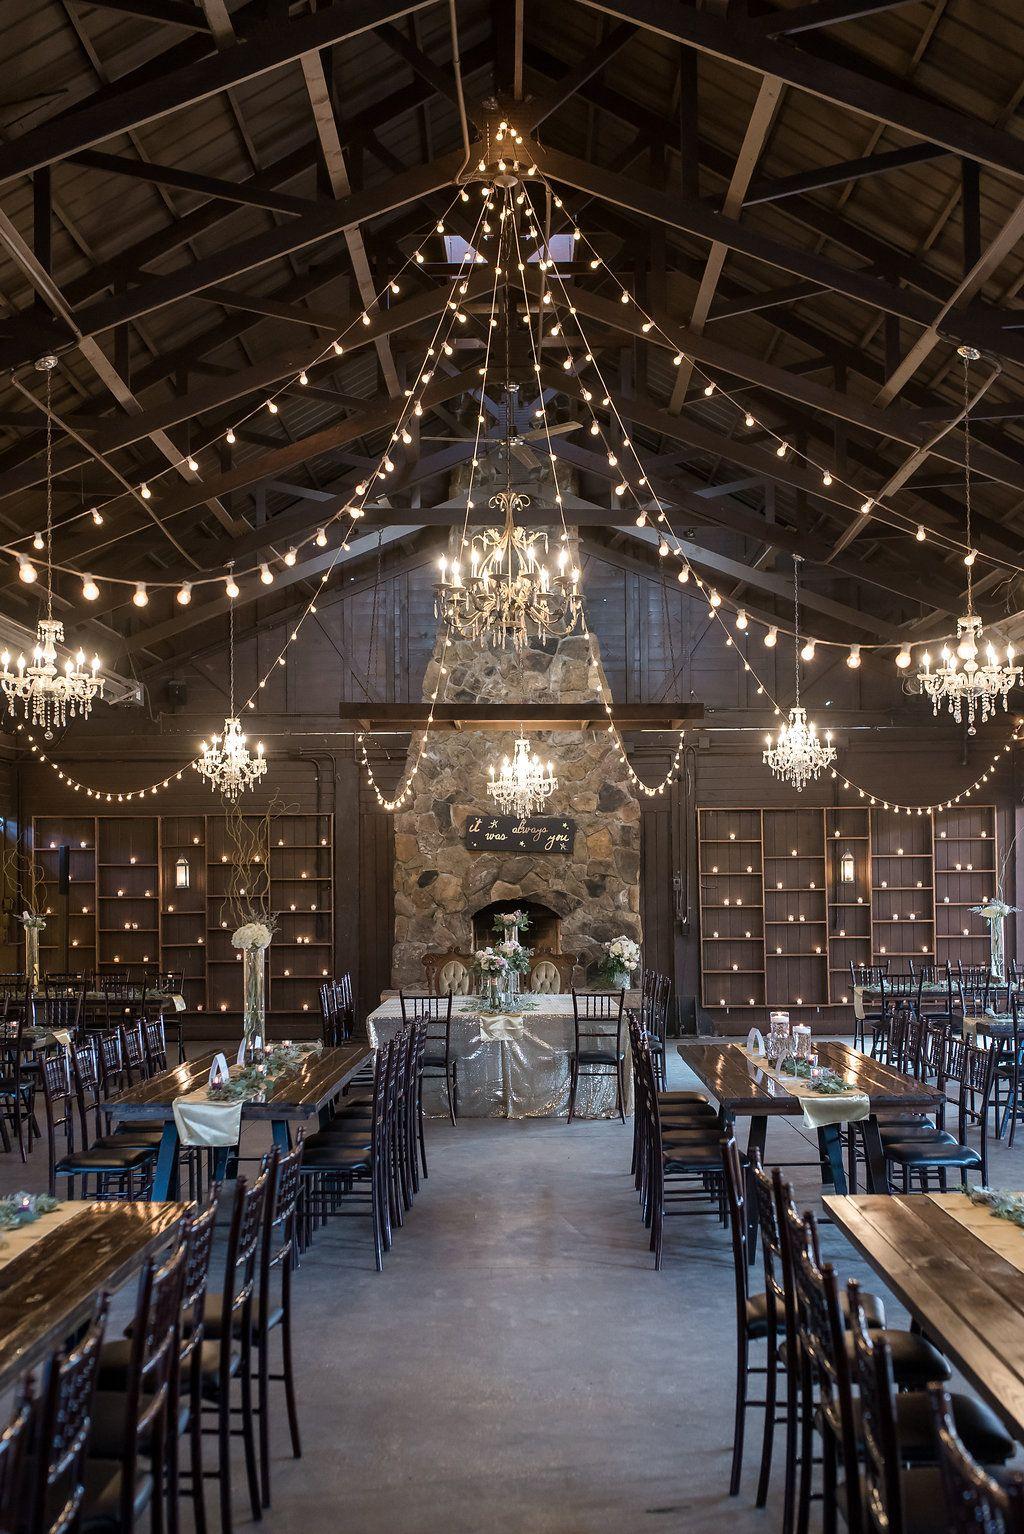 Hope Glen Farm Reception So And Elegant For An Outdoor Wedding